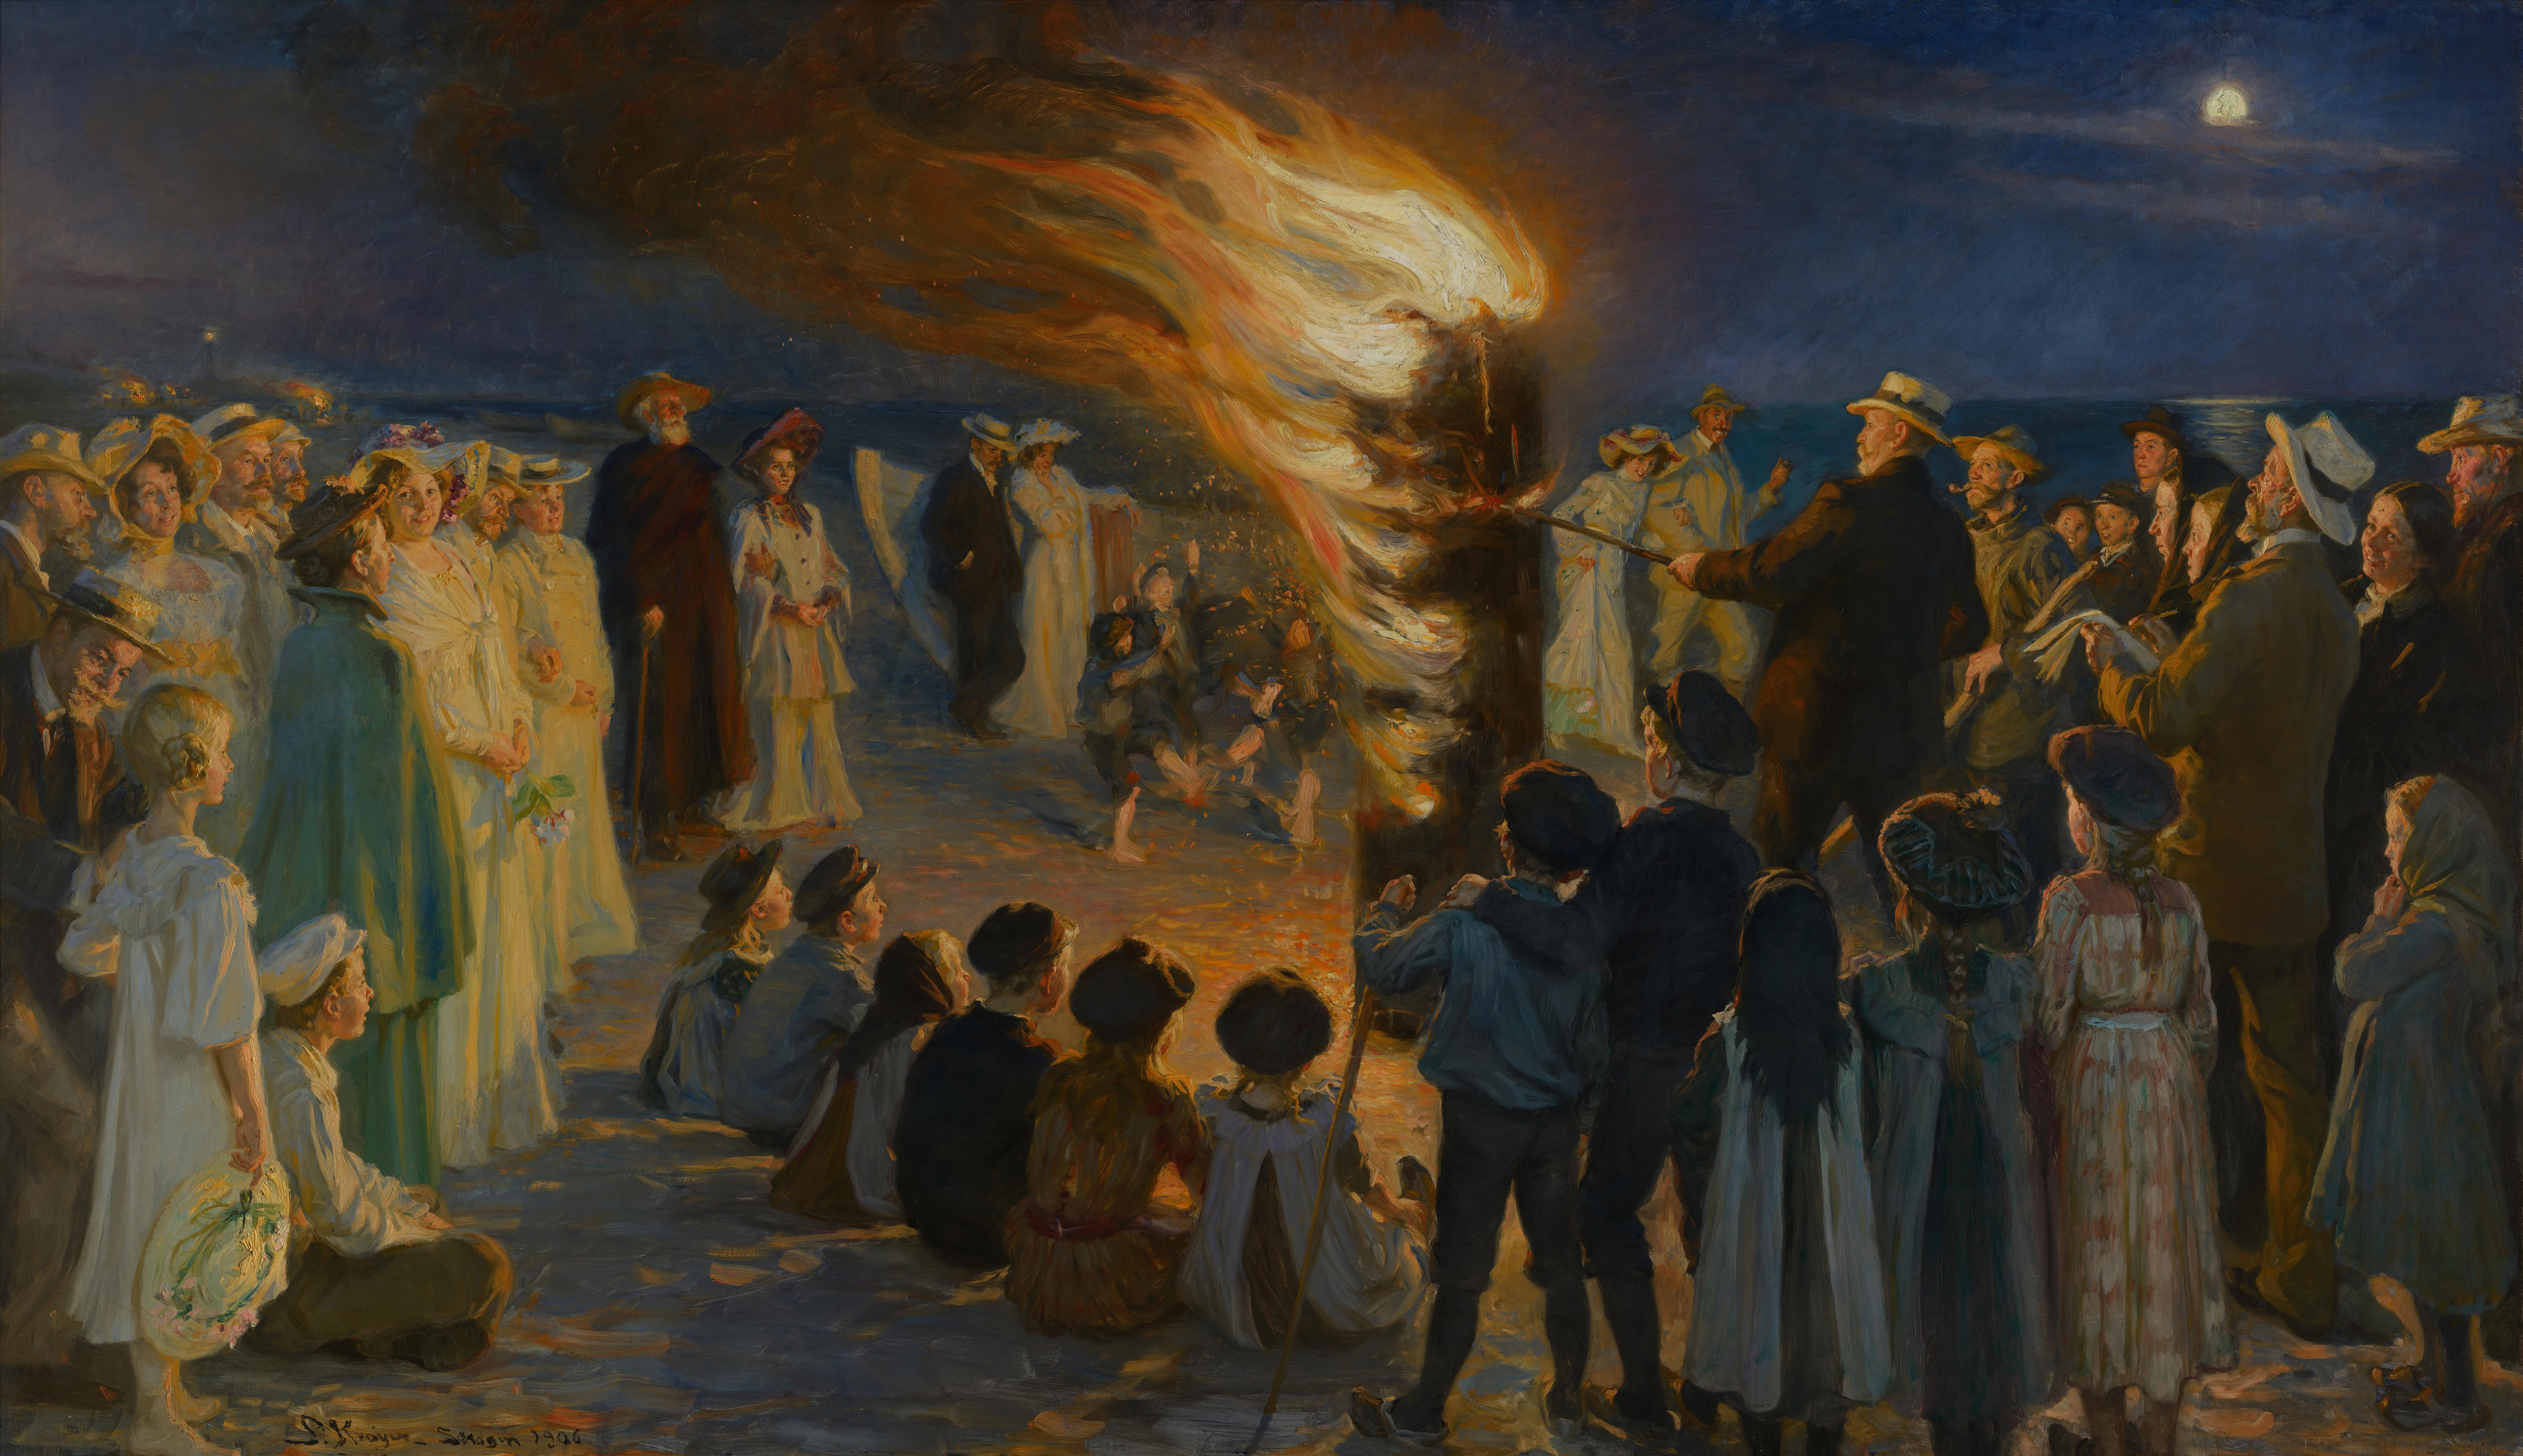 Midsummer Eve bonfire on Skagen%27s beach   P.S. Kr%C3%B8yer   Google Cultural Institute Top Result 50 Inspirational Bond Fire Table Picture 2017 Iqt4